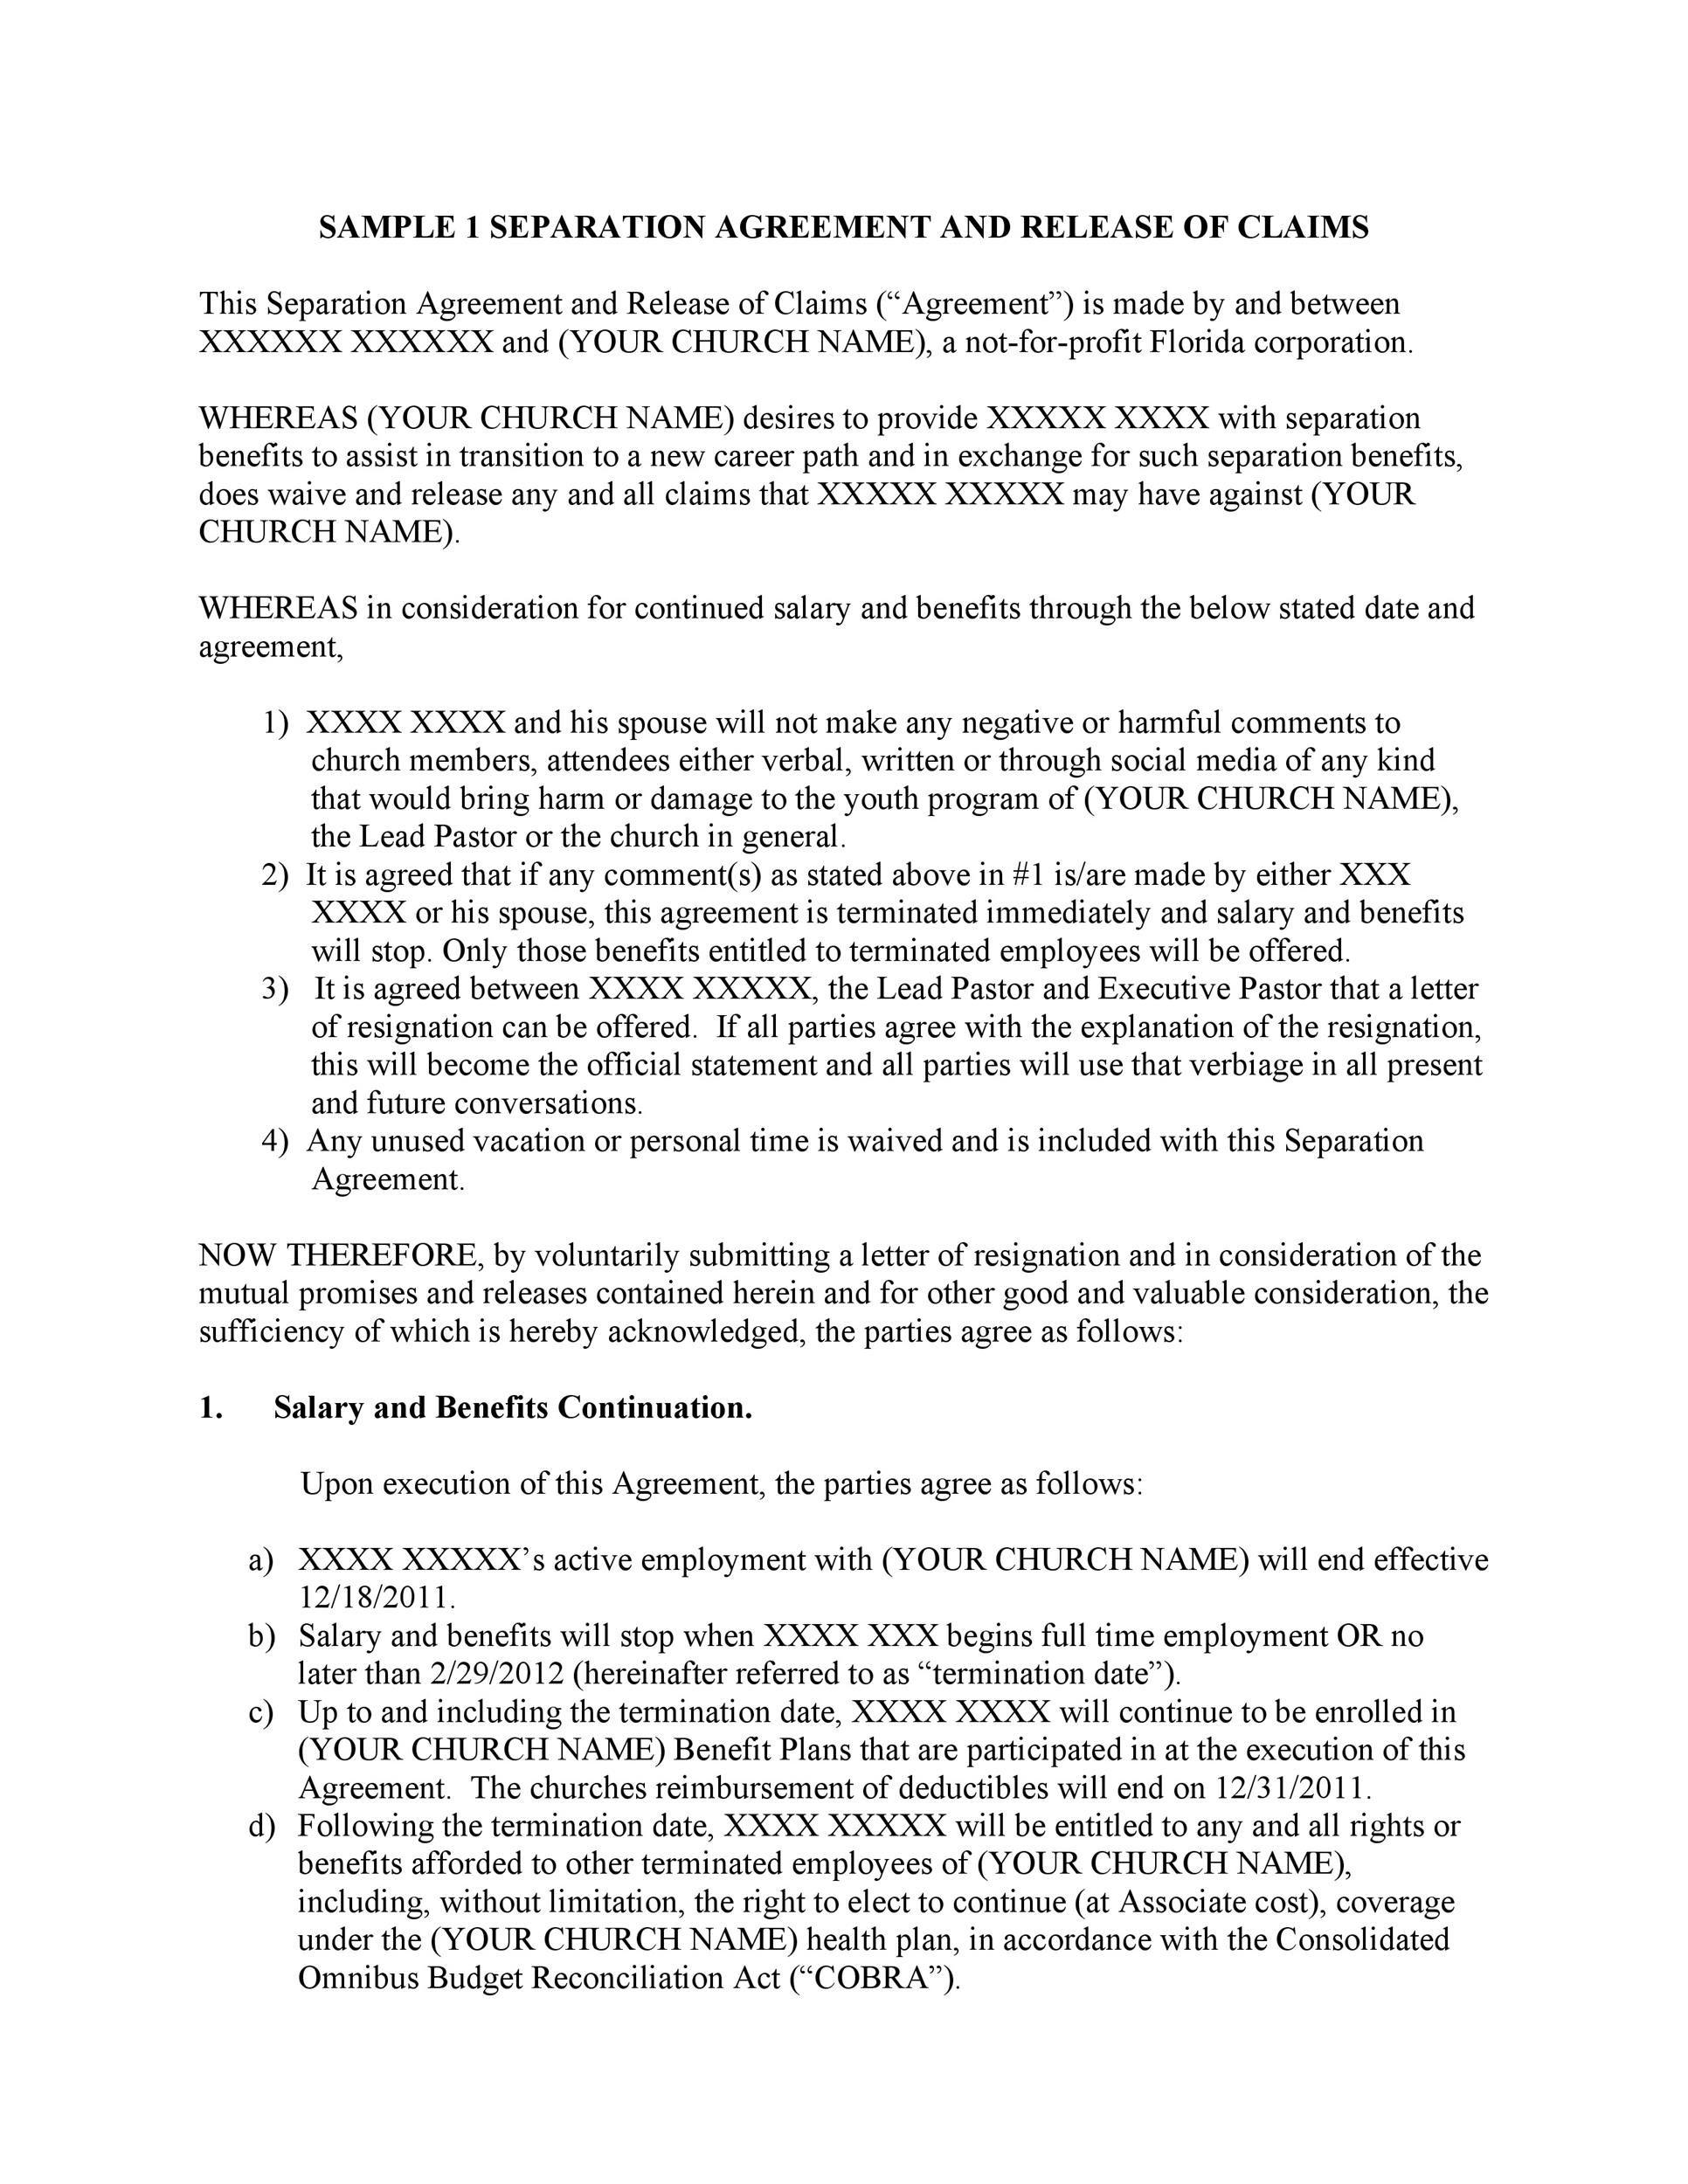 007 Unbelievable Busines Partnership Separation Agreement Template Inspiration  Partner TerminationFull